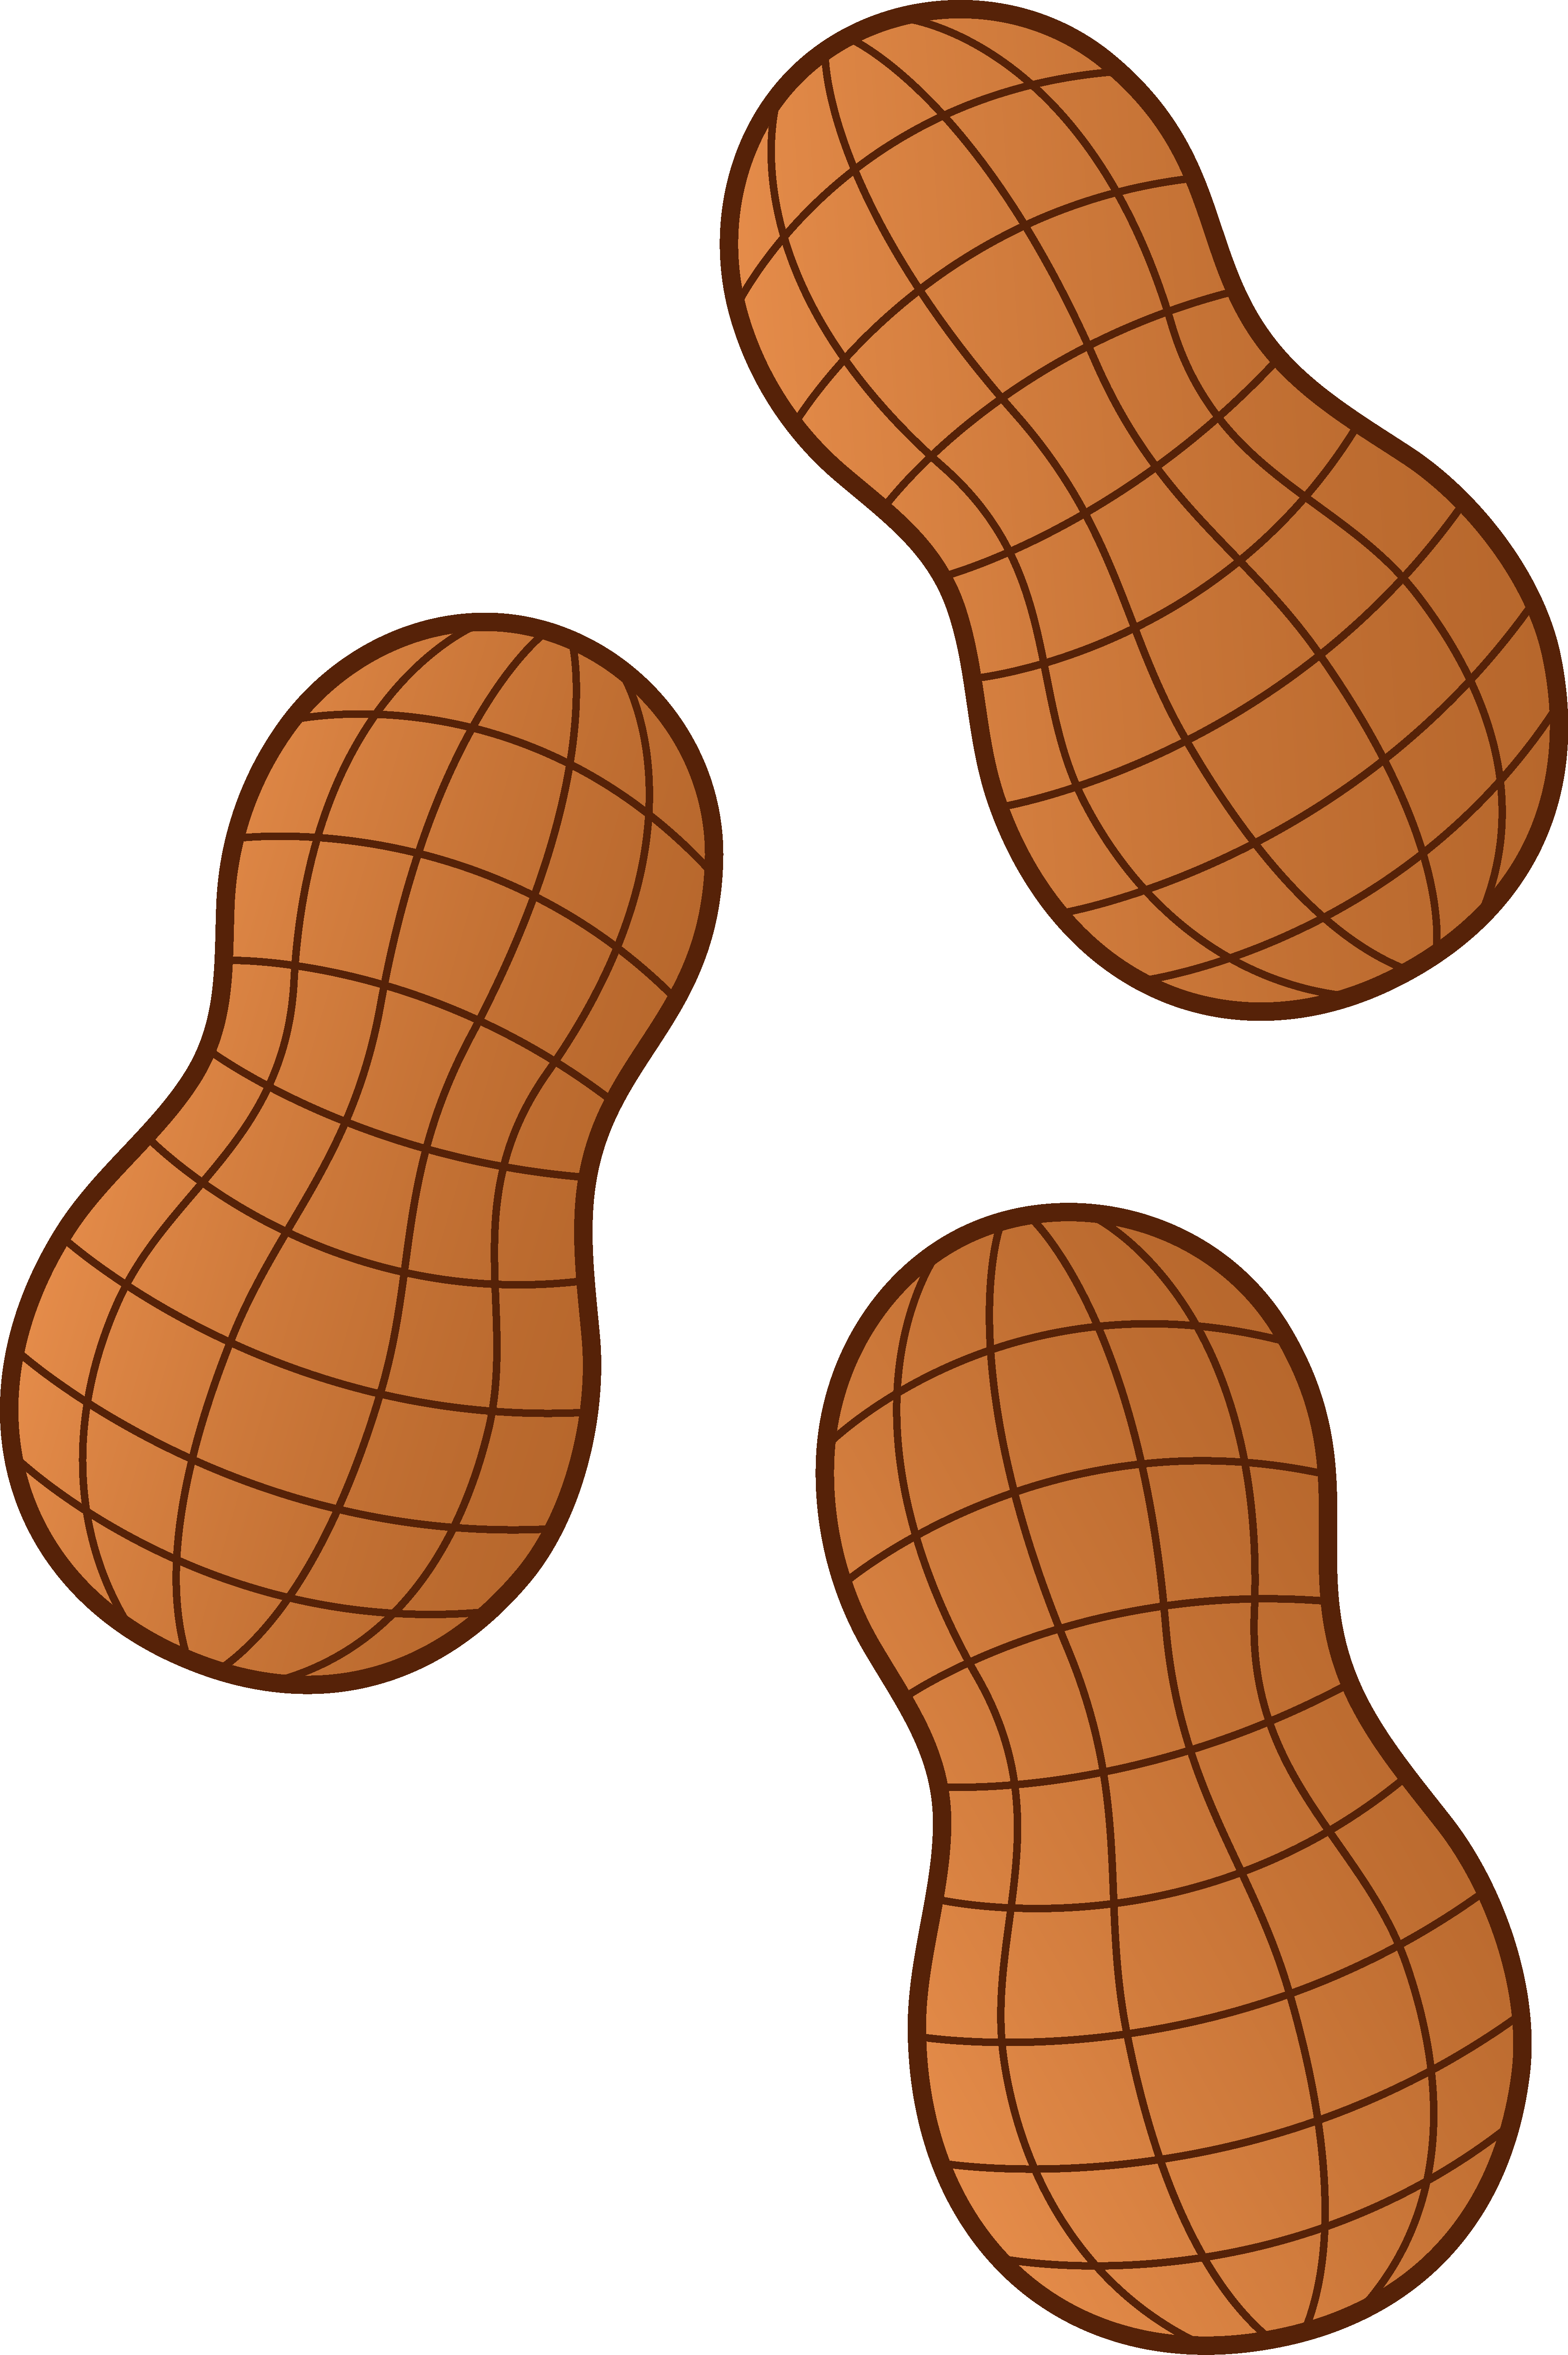 3567x5357 Clipart Peanuts